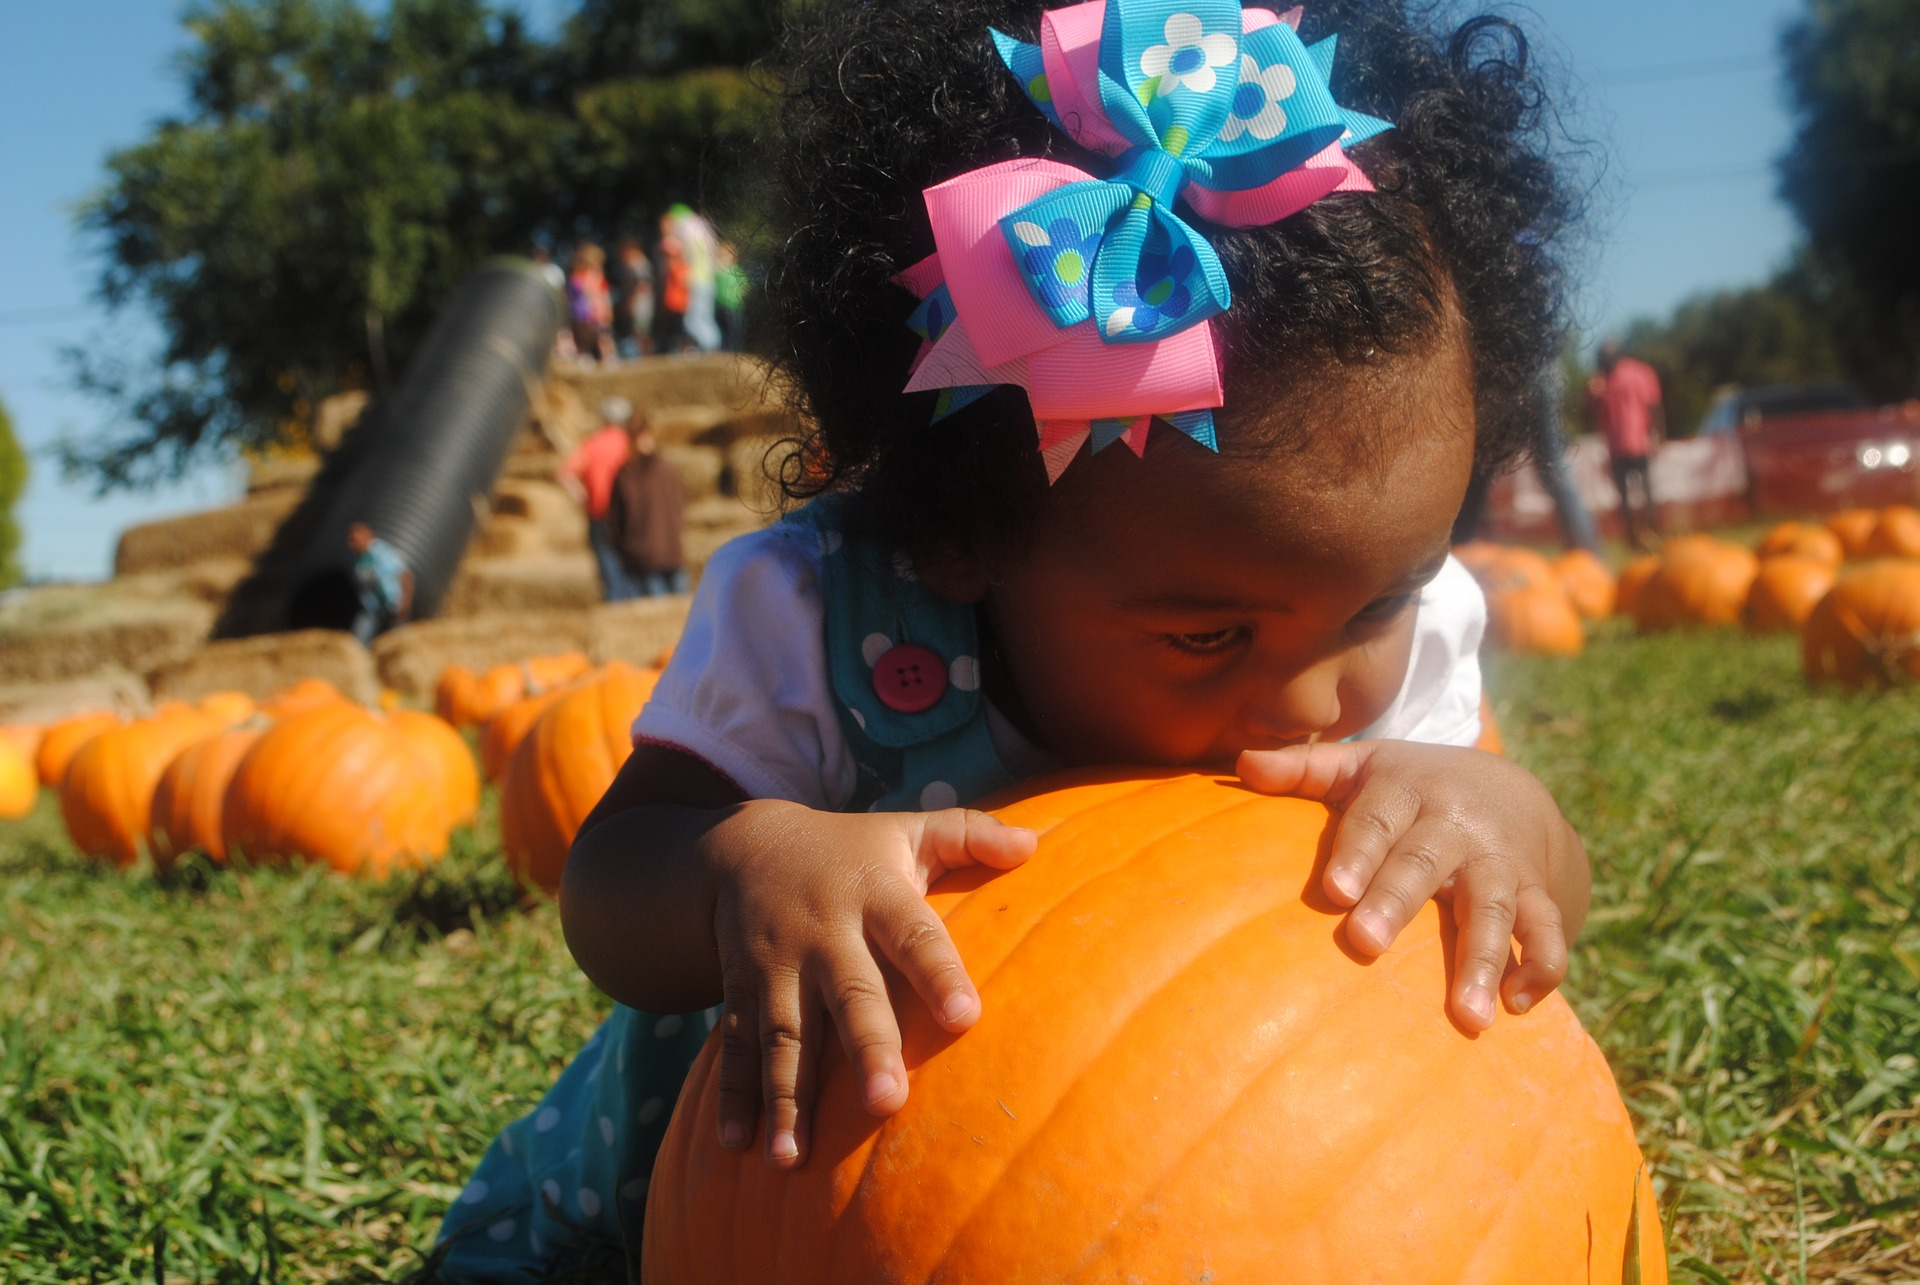 A small girl hugging a pumpkin in a field